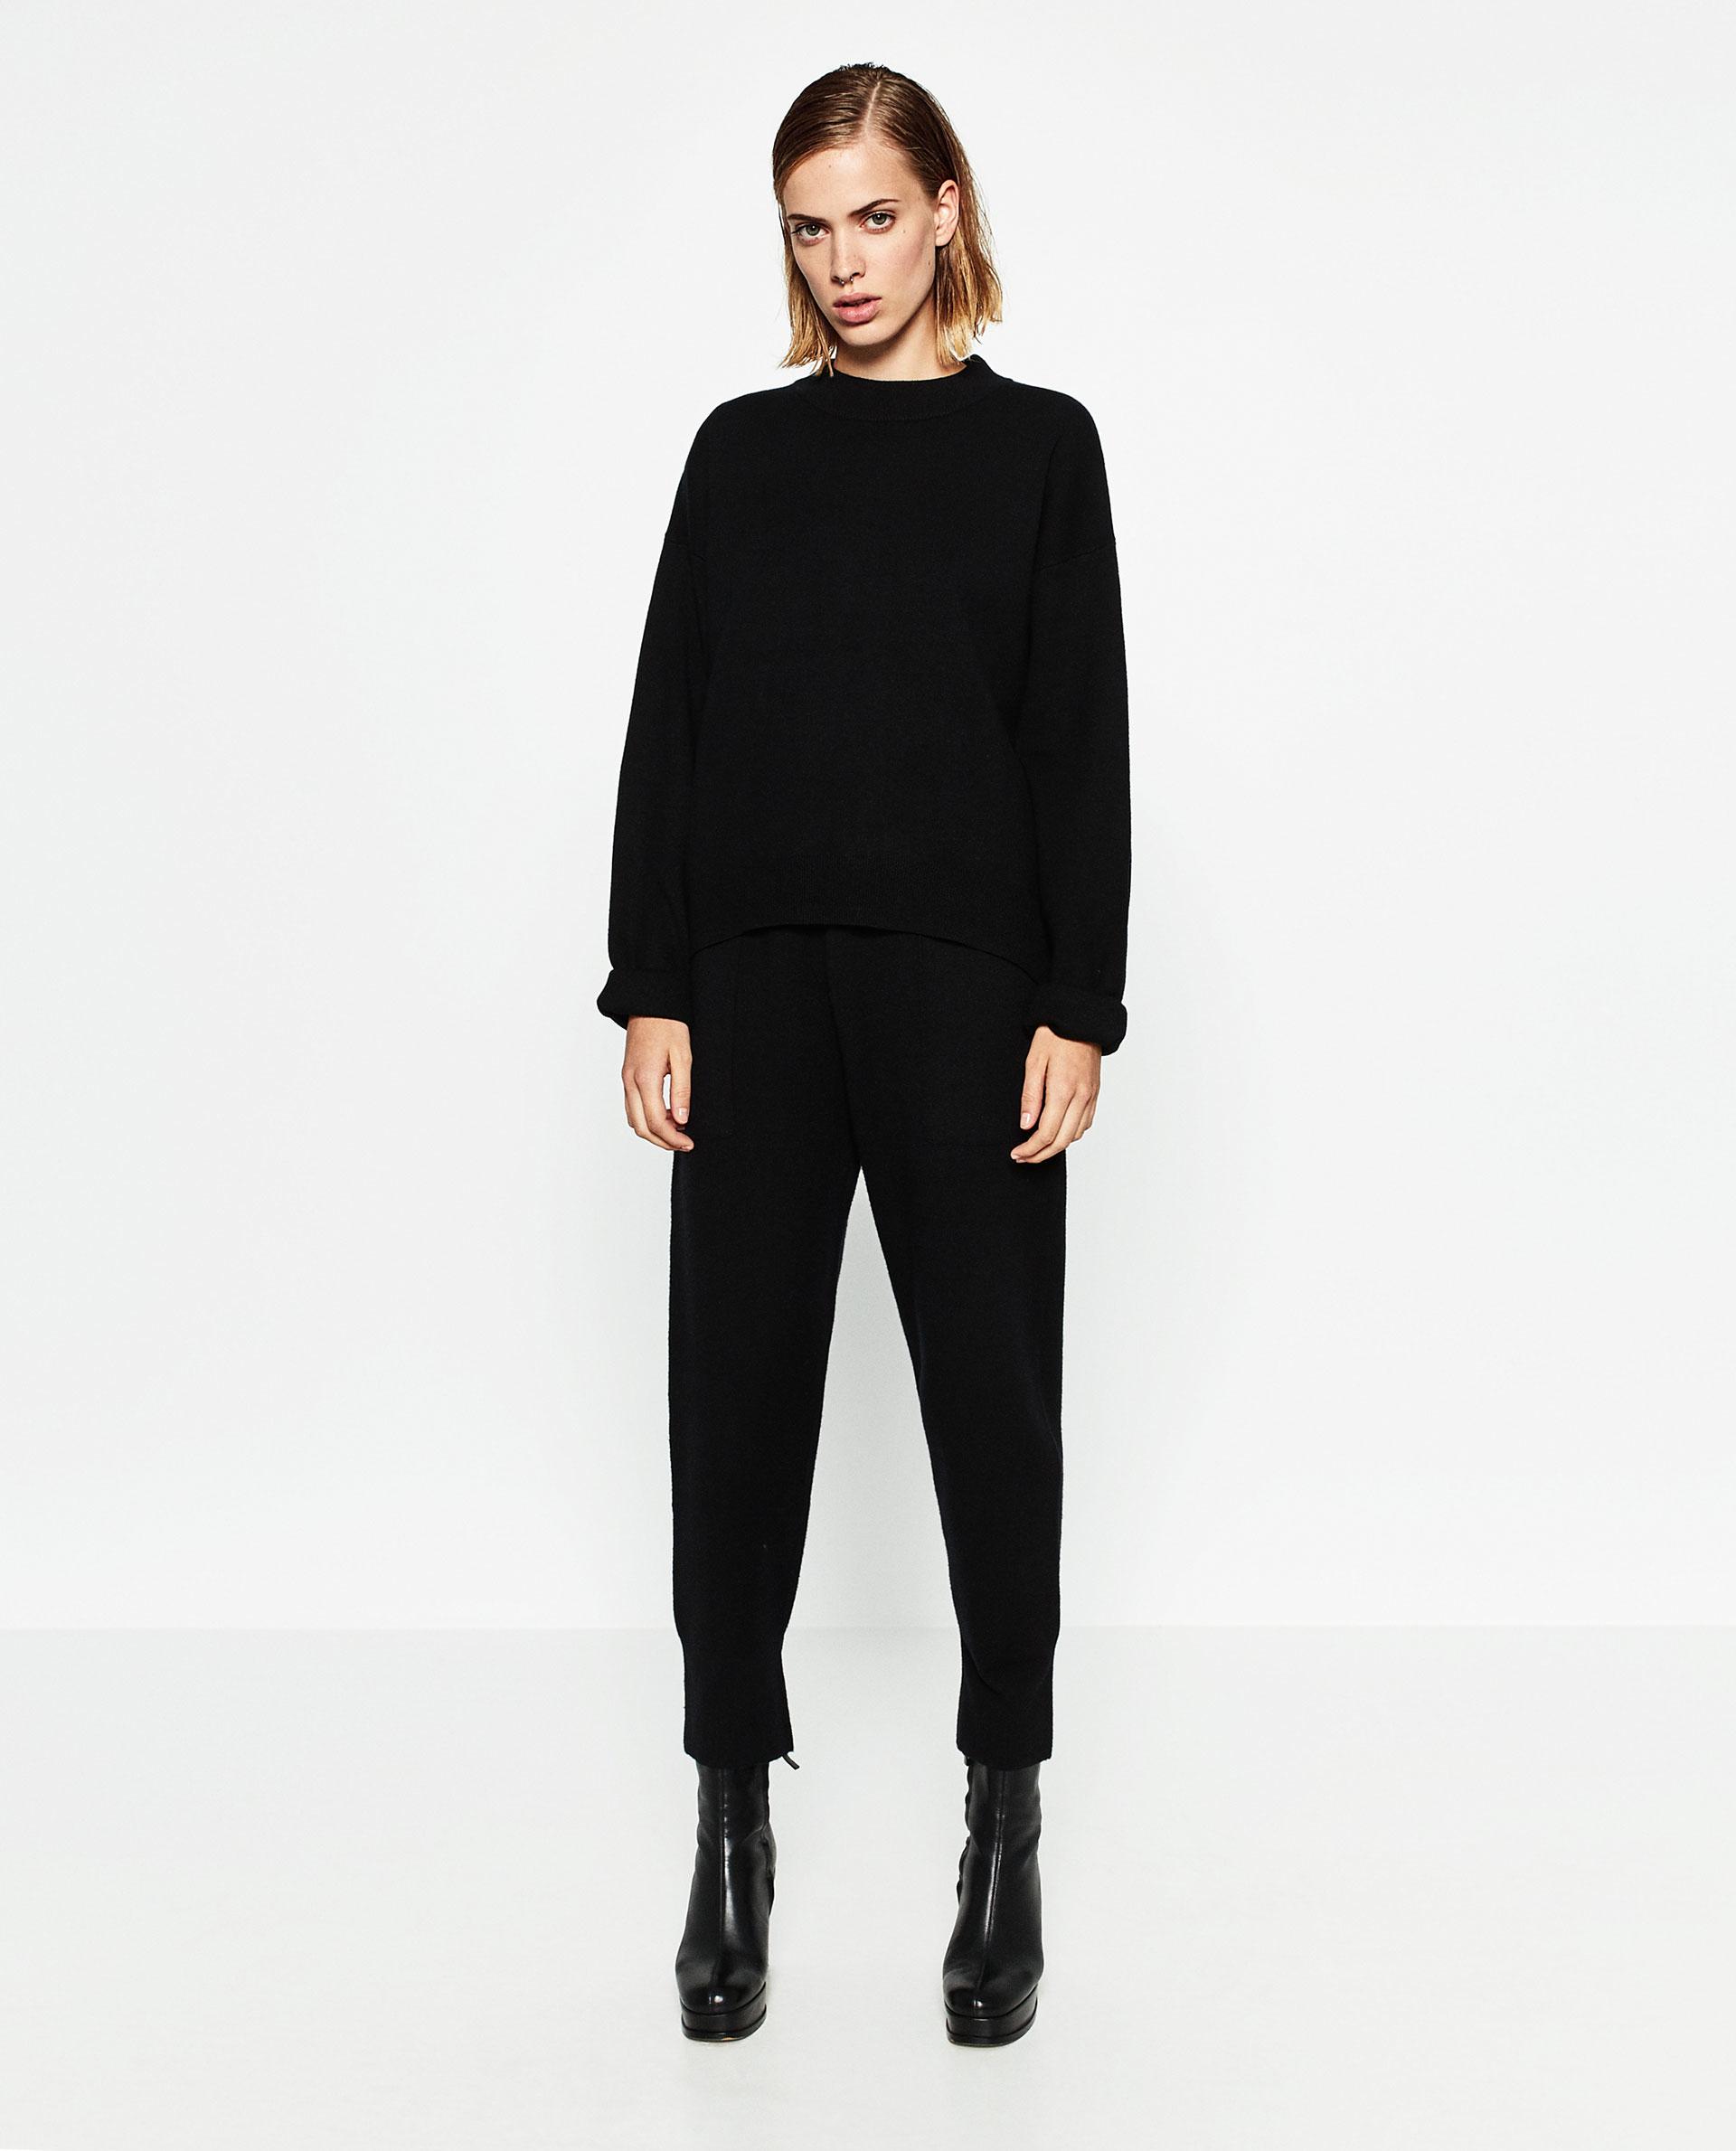 Unique Zara Baggy Trousers In Black  Lyst